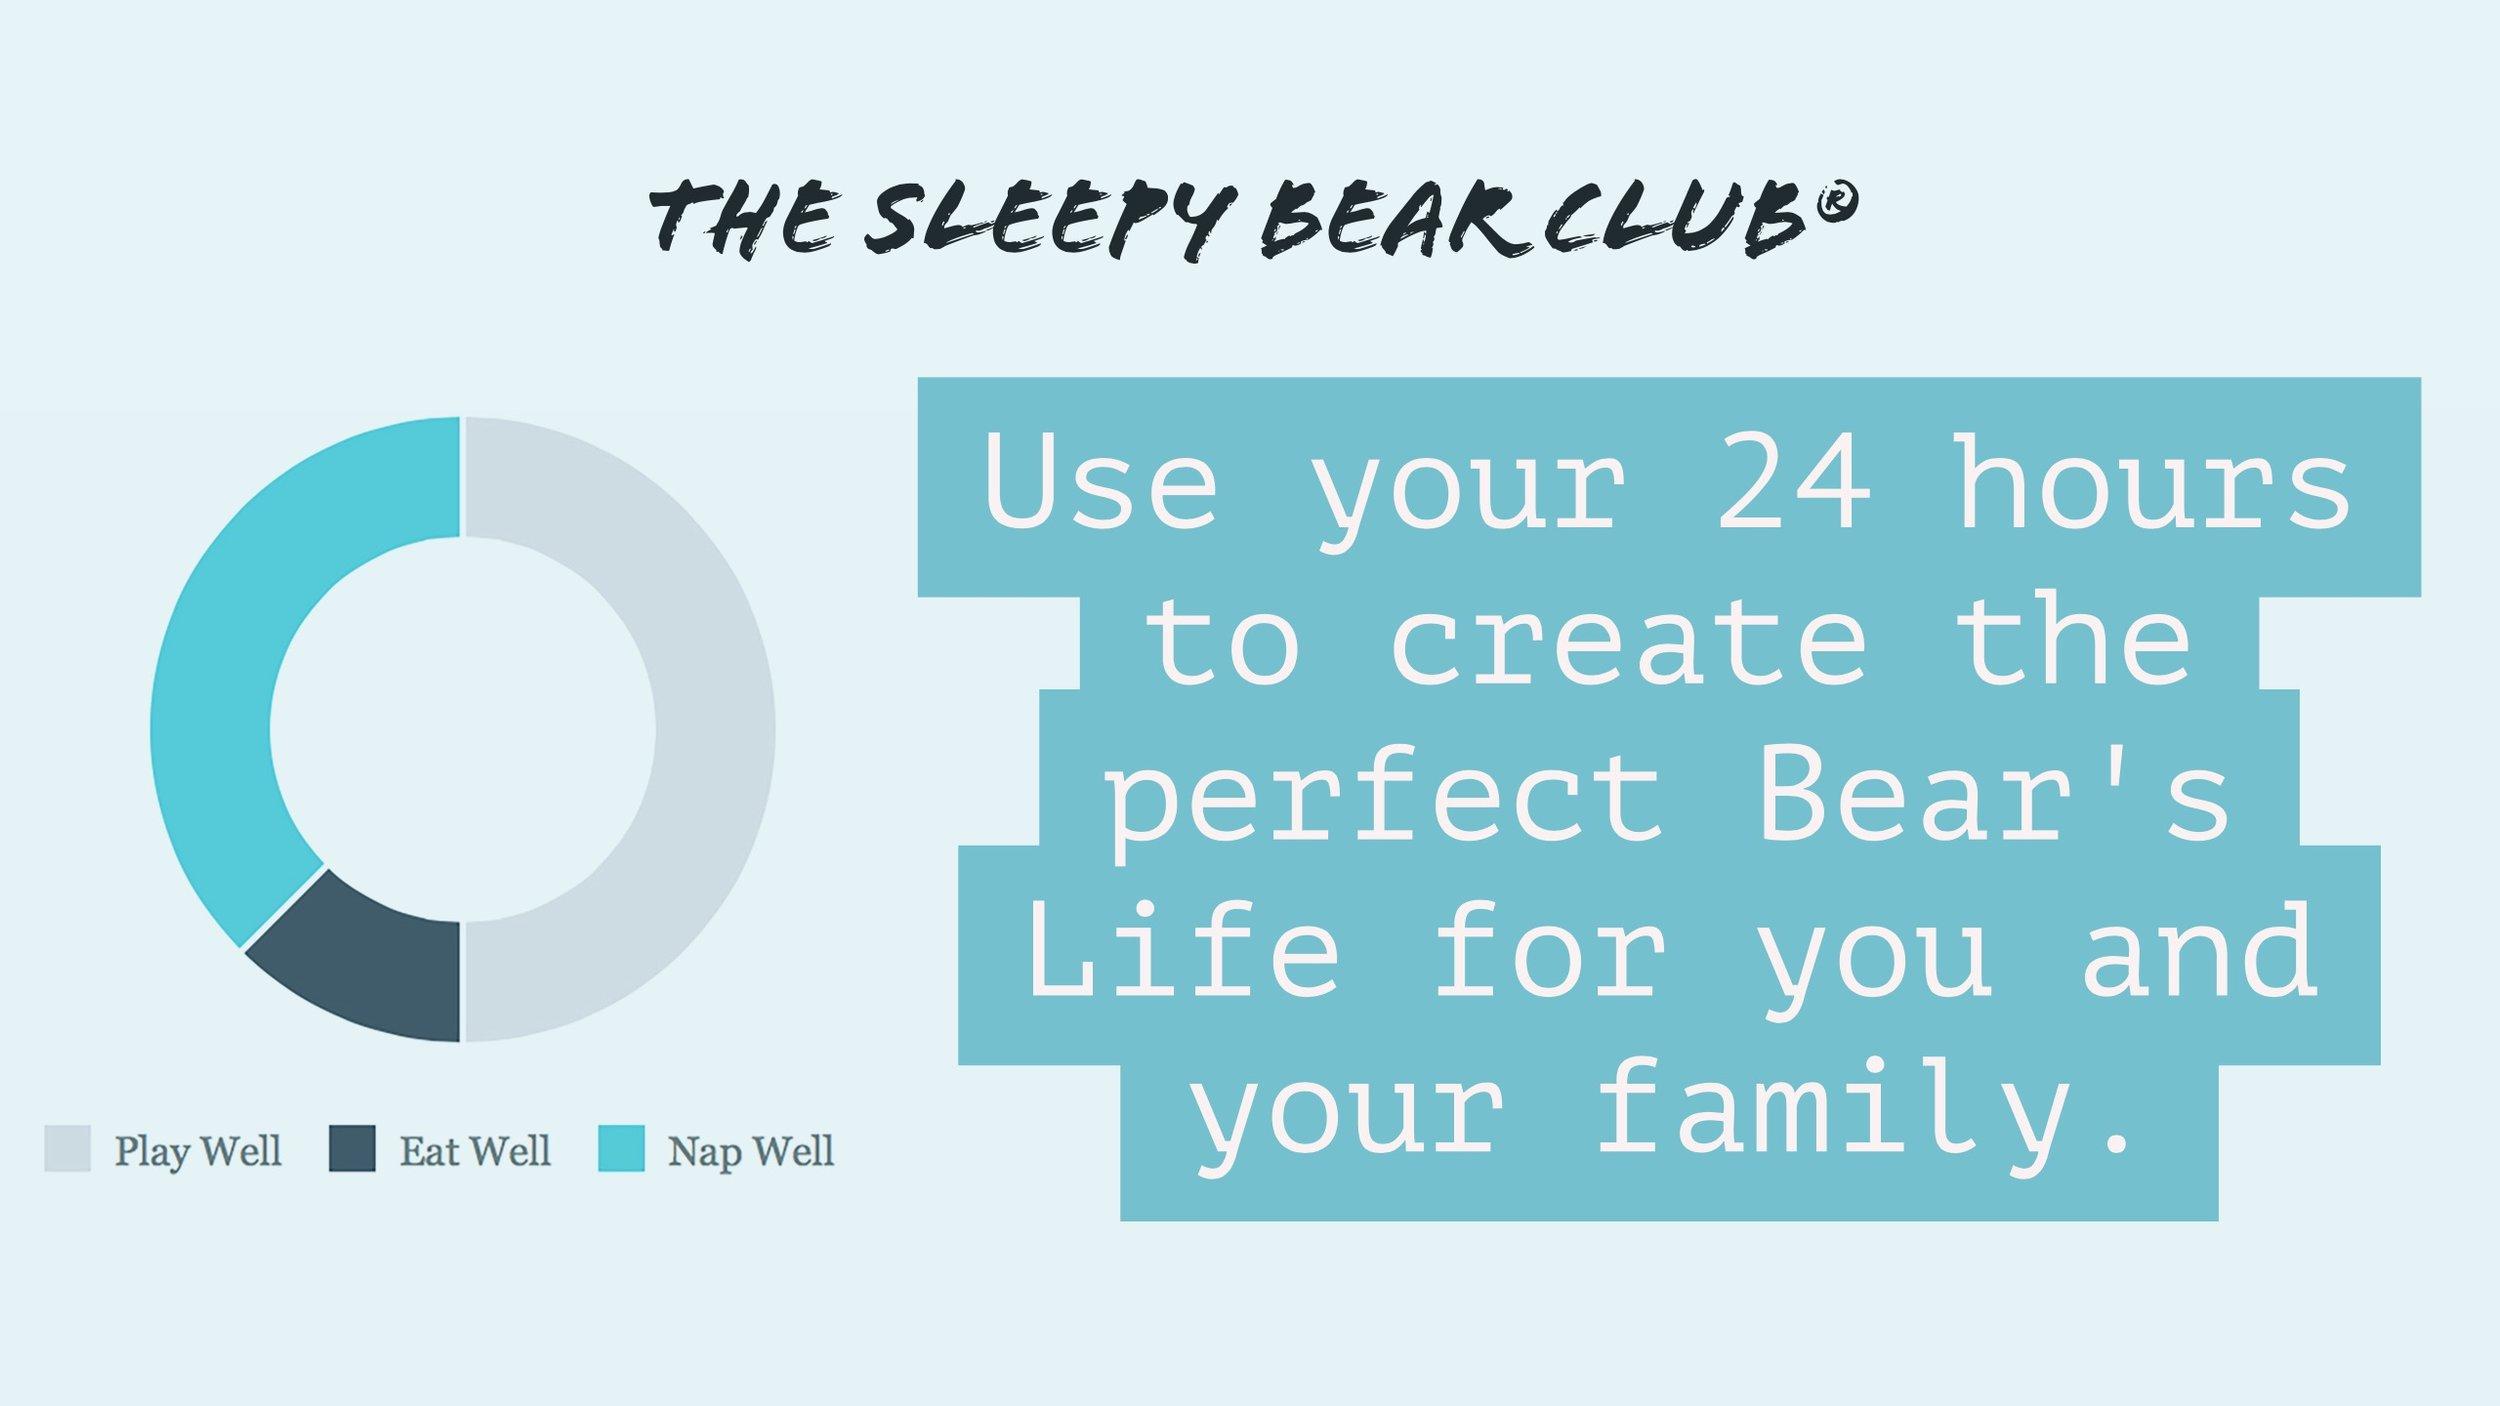 A Bear's Life with The Sleepy Bear Club by Jennifer Grantham